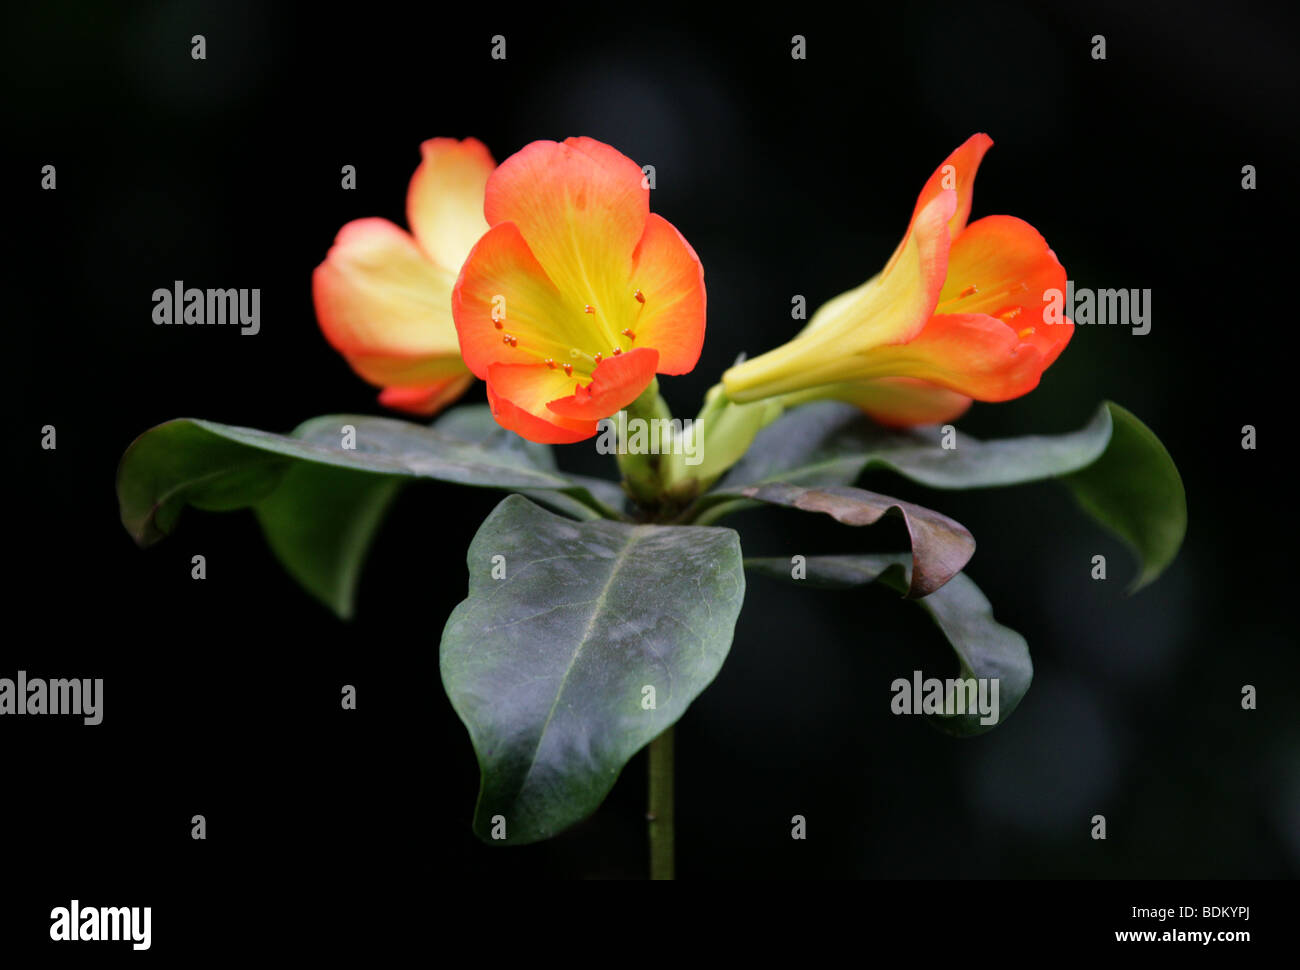 Vireya Rhododendron, Rhododendron zoelleri, Ericaceae, New Guinea, Moluccas - Stock Image